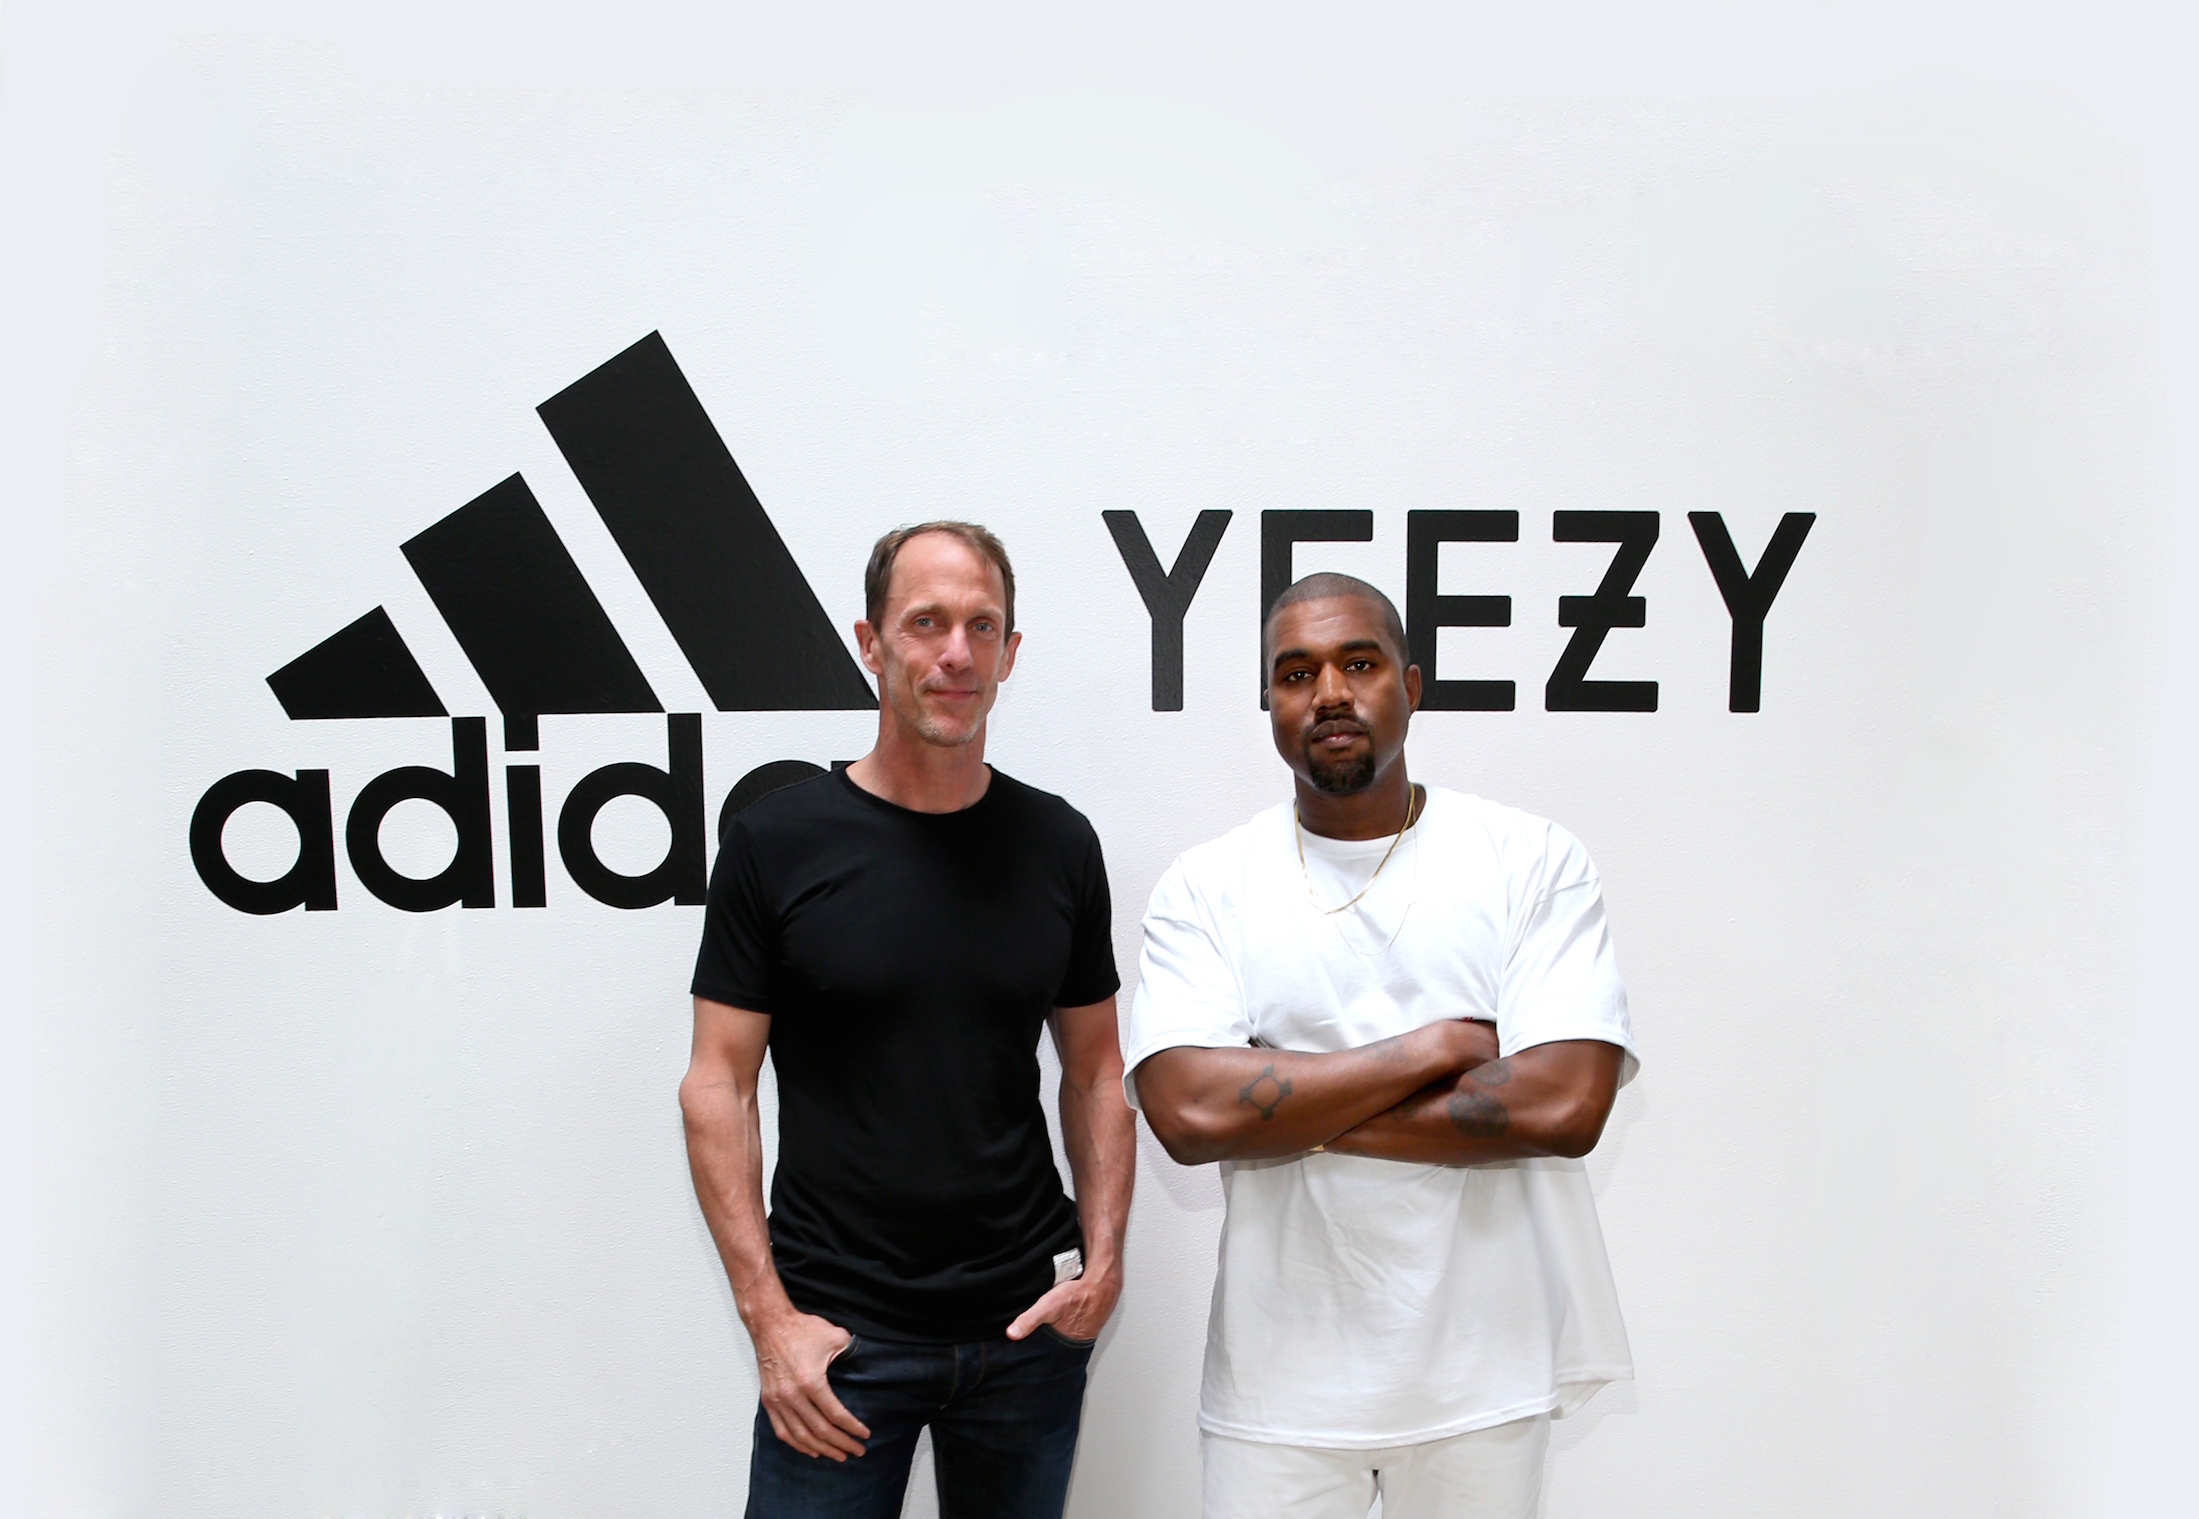 adidas and Kanye West make history with transformative new partnership